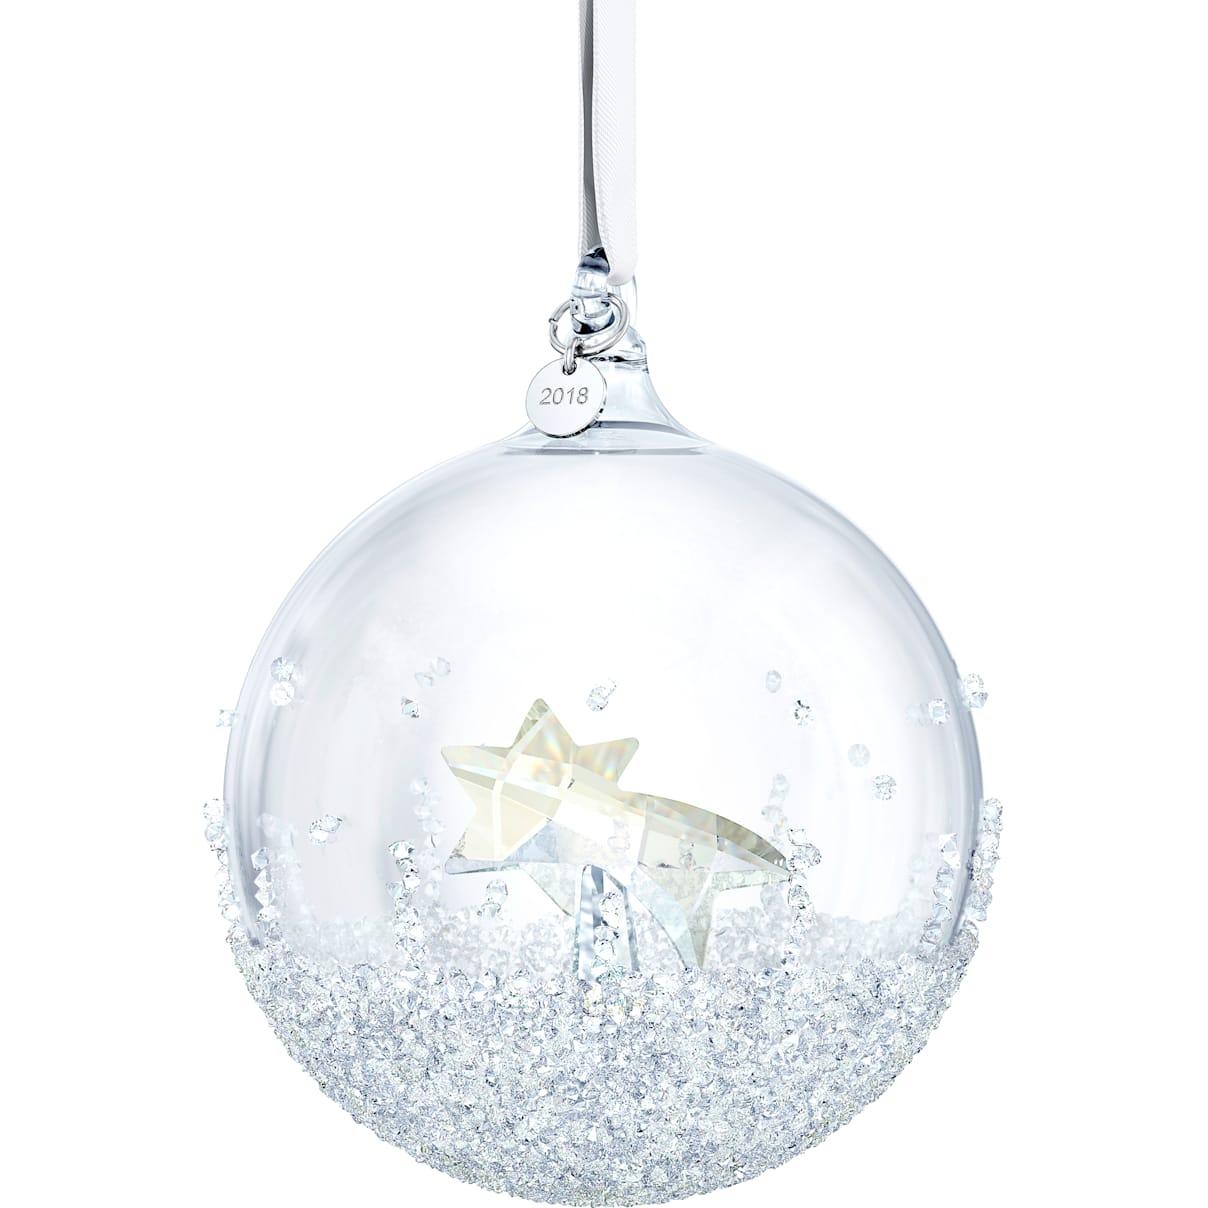 Swarovski Christmas Ball Ornament, Annual Edition 2018